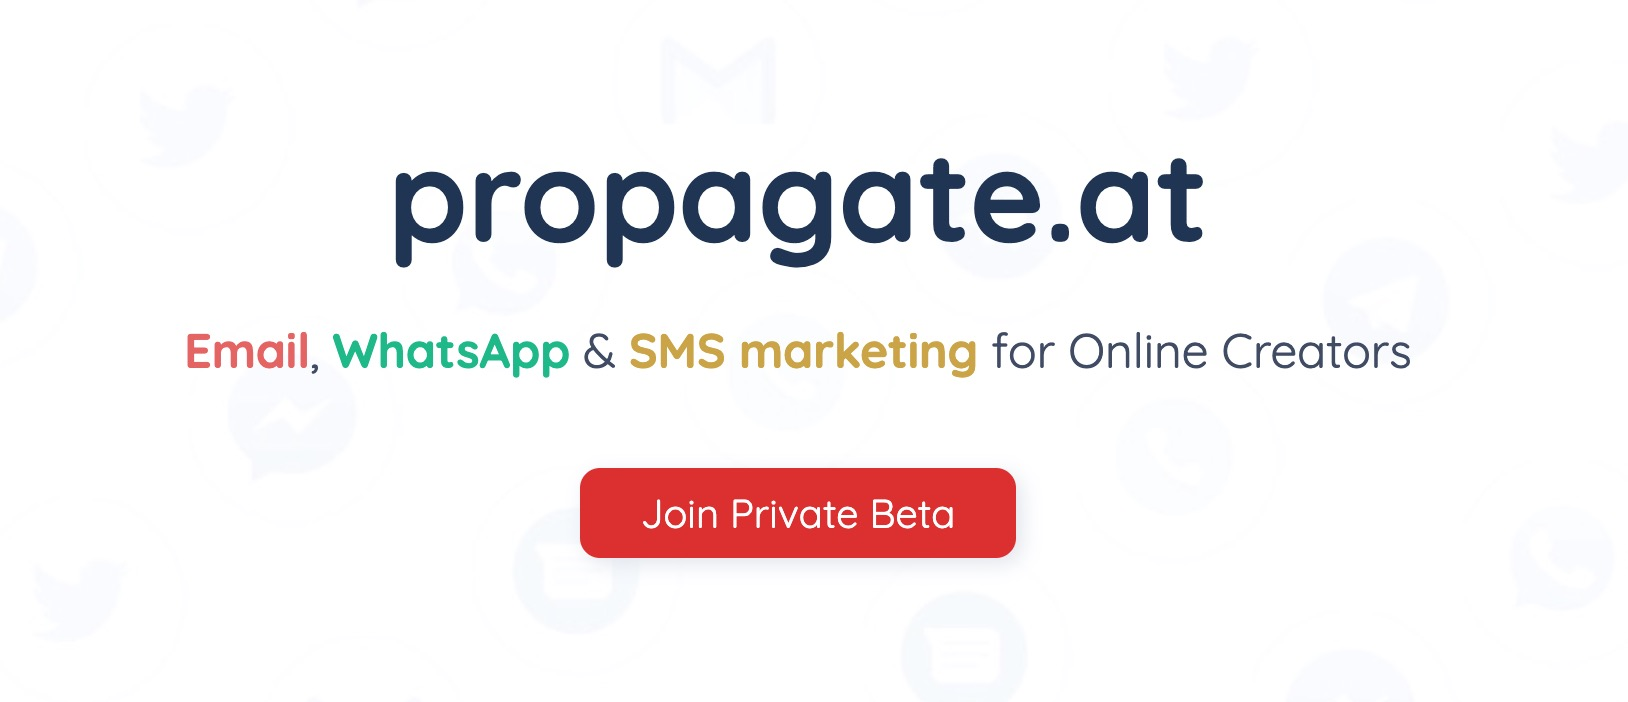 PropagateAt Home Page